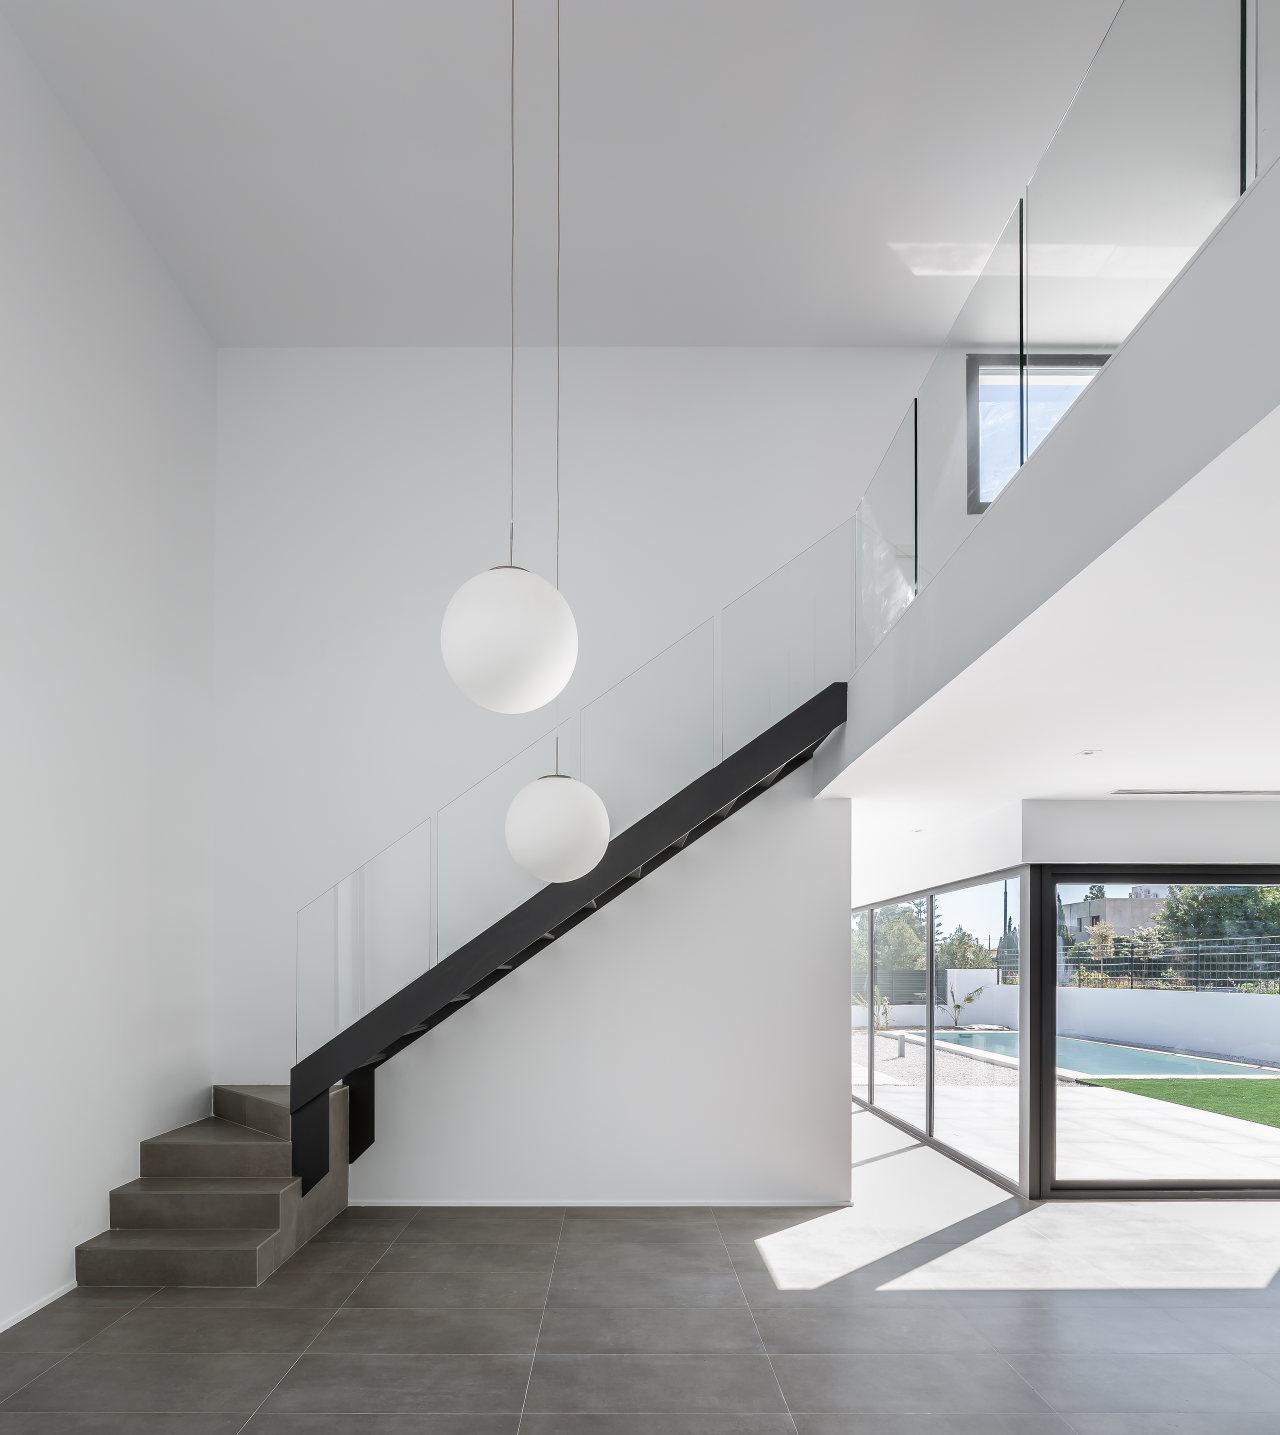 fotografia-arquitectura-valencia-german-cabo-viraje-el-vedat-torrent (19)